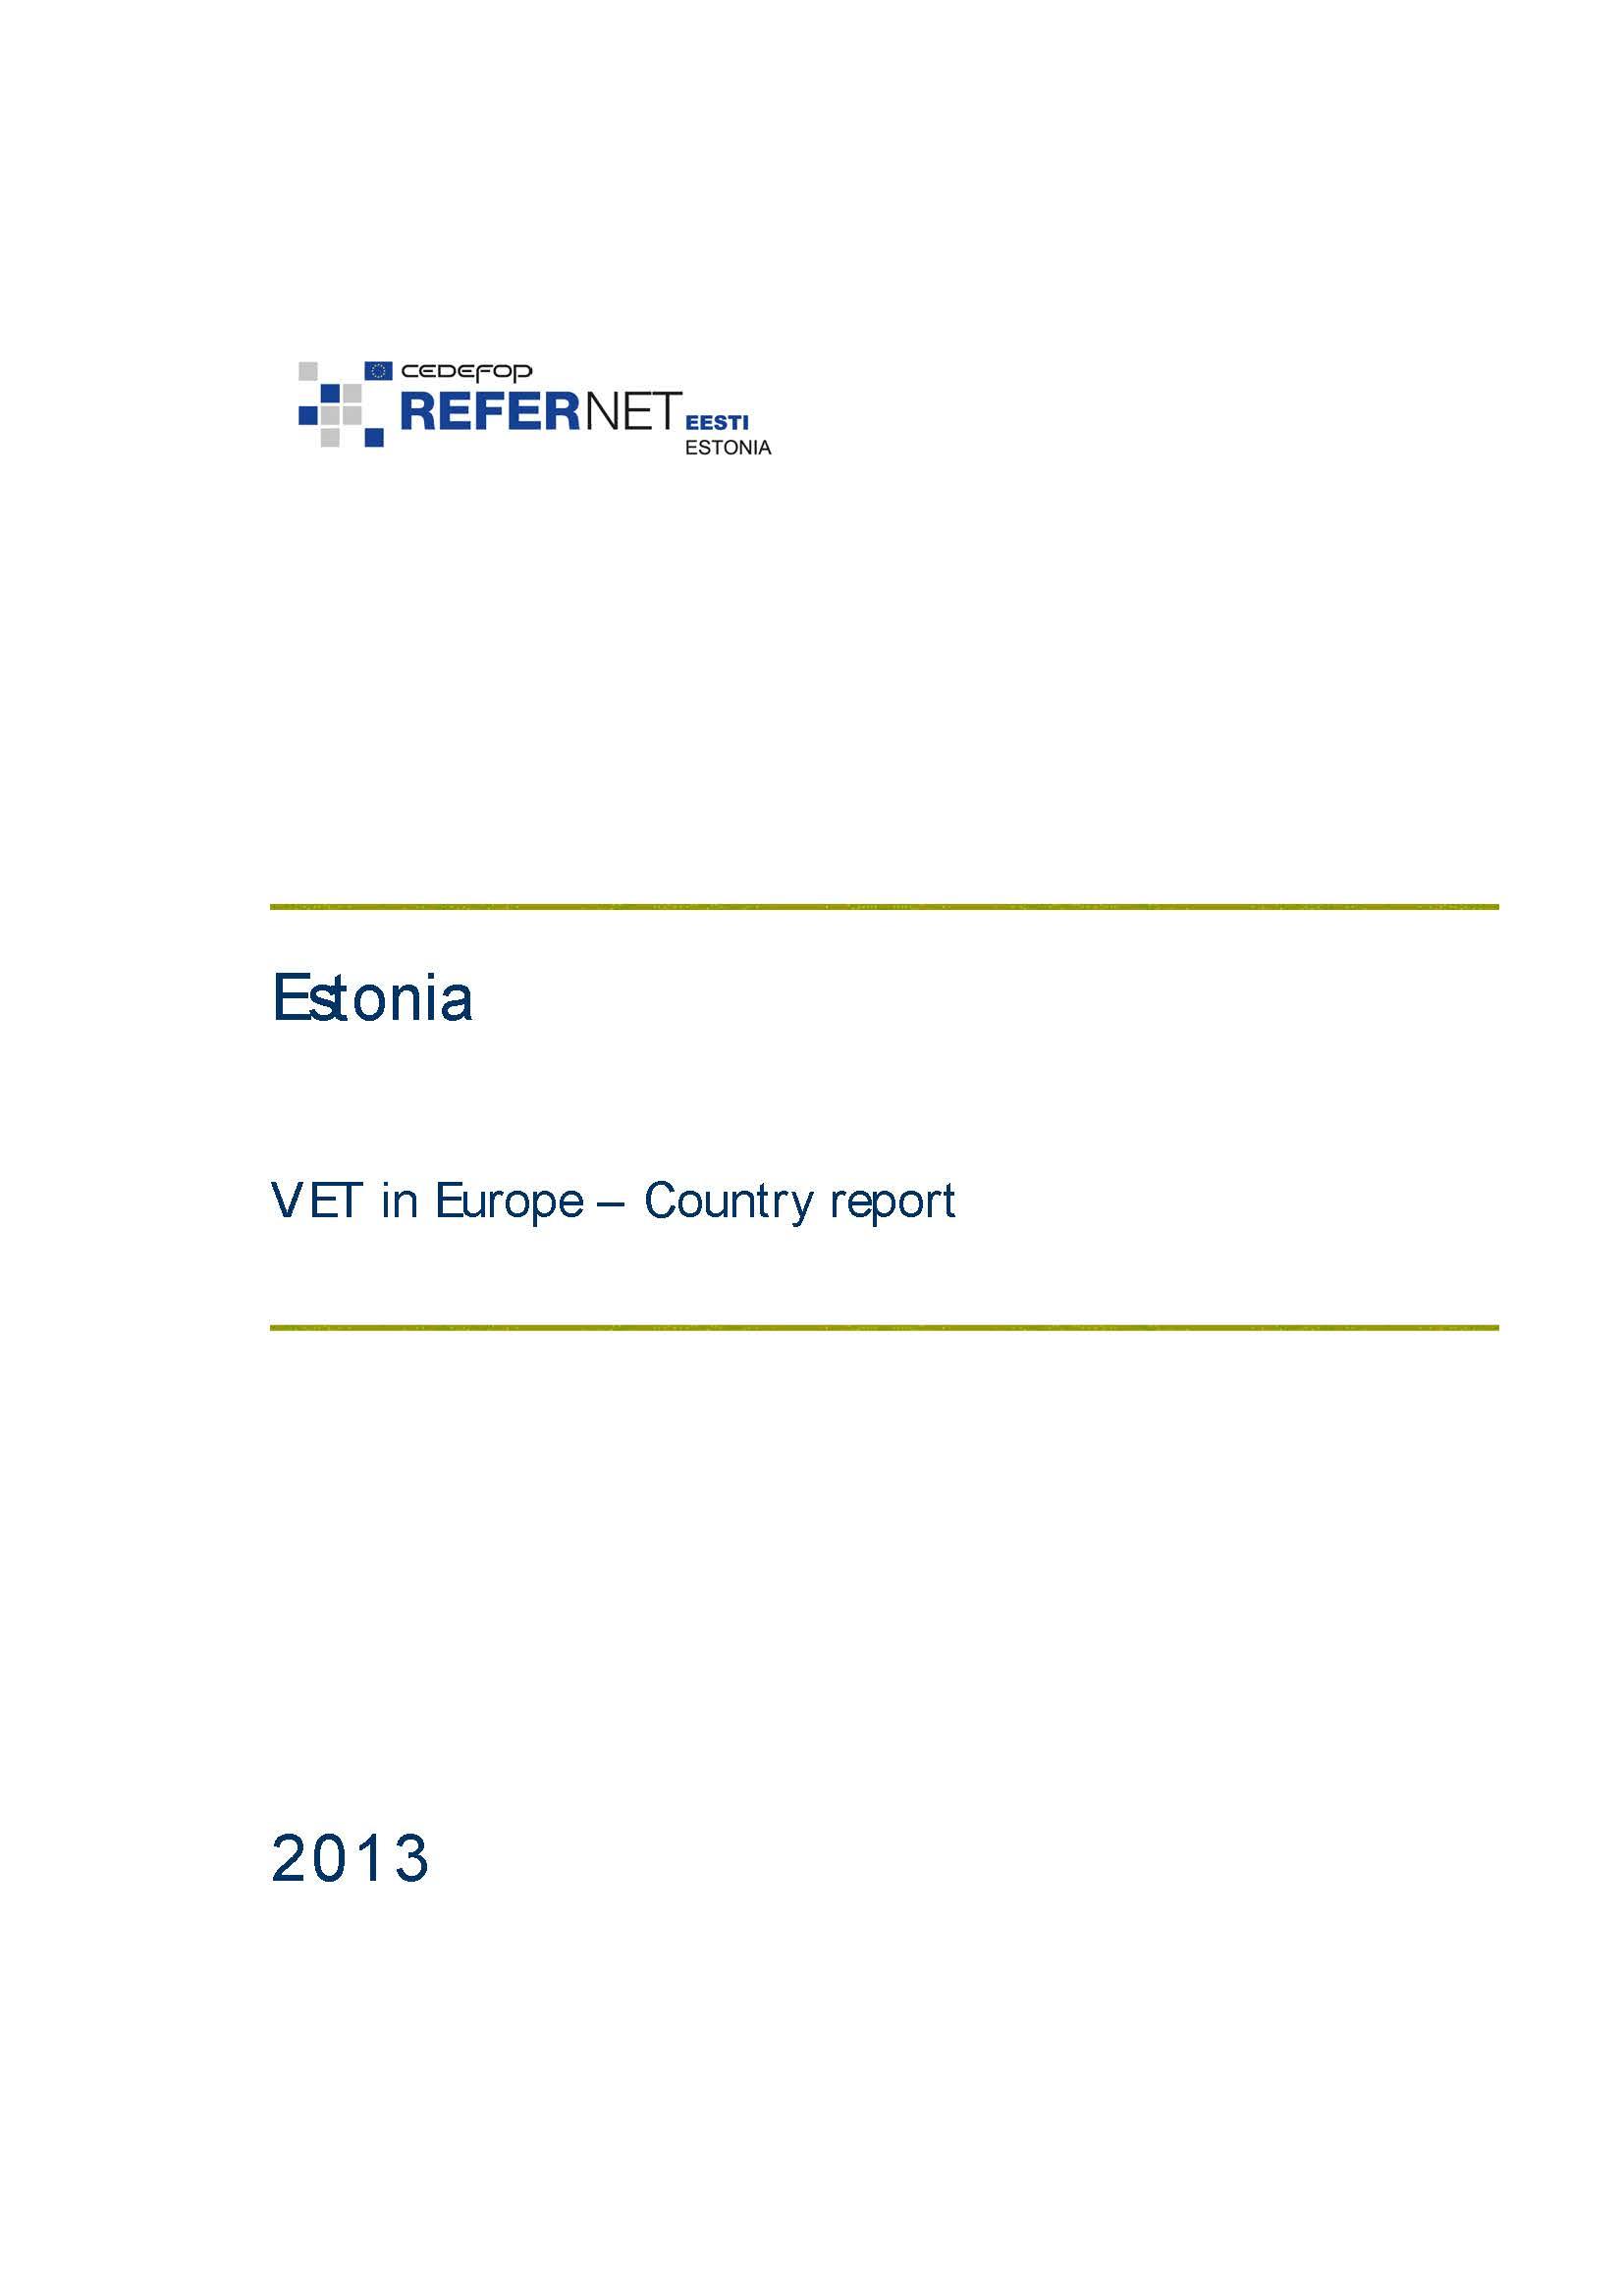 Estonia: VET in Europe: country report 2013